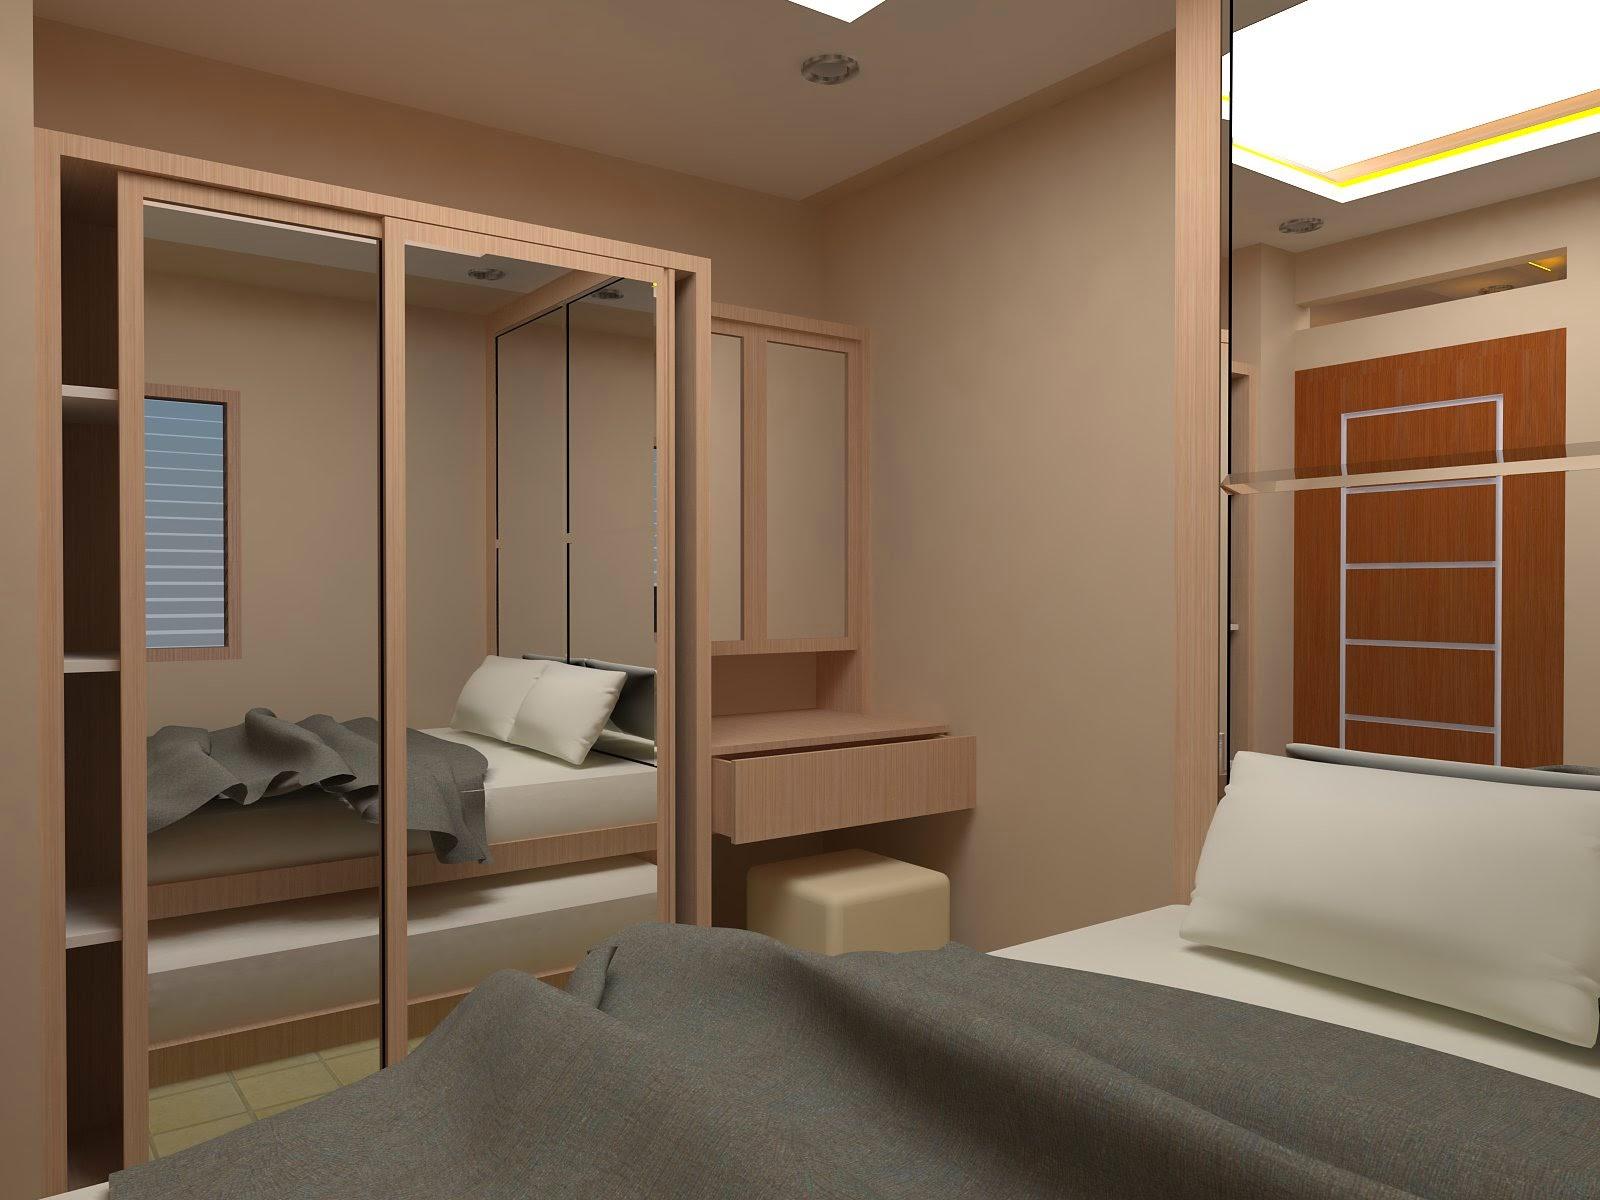 Info apartemen apartemen di bandung design interior for Design apartemen 2 kamar